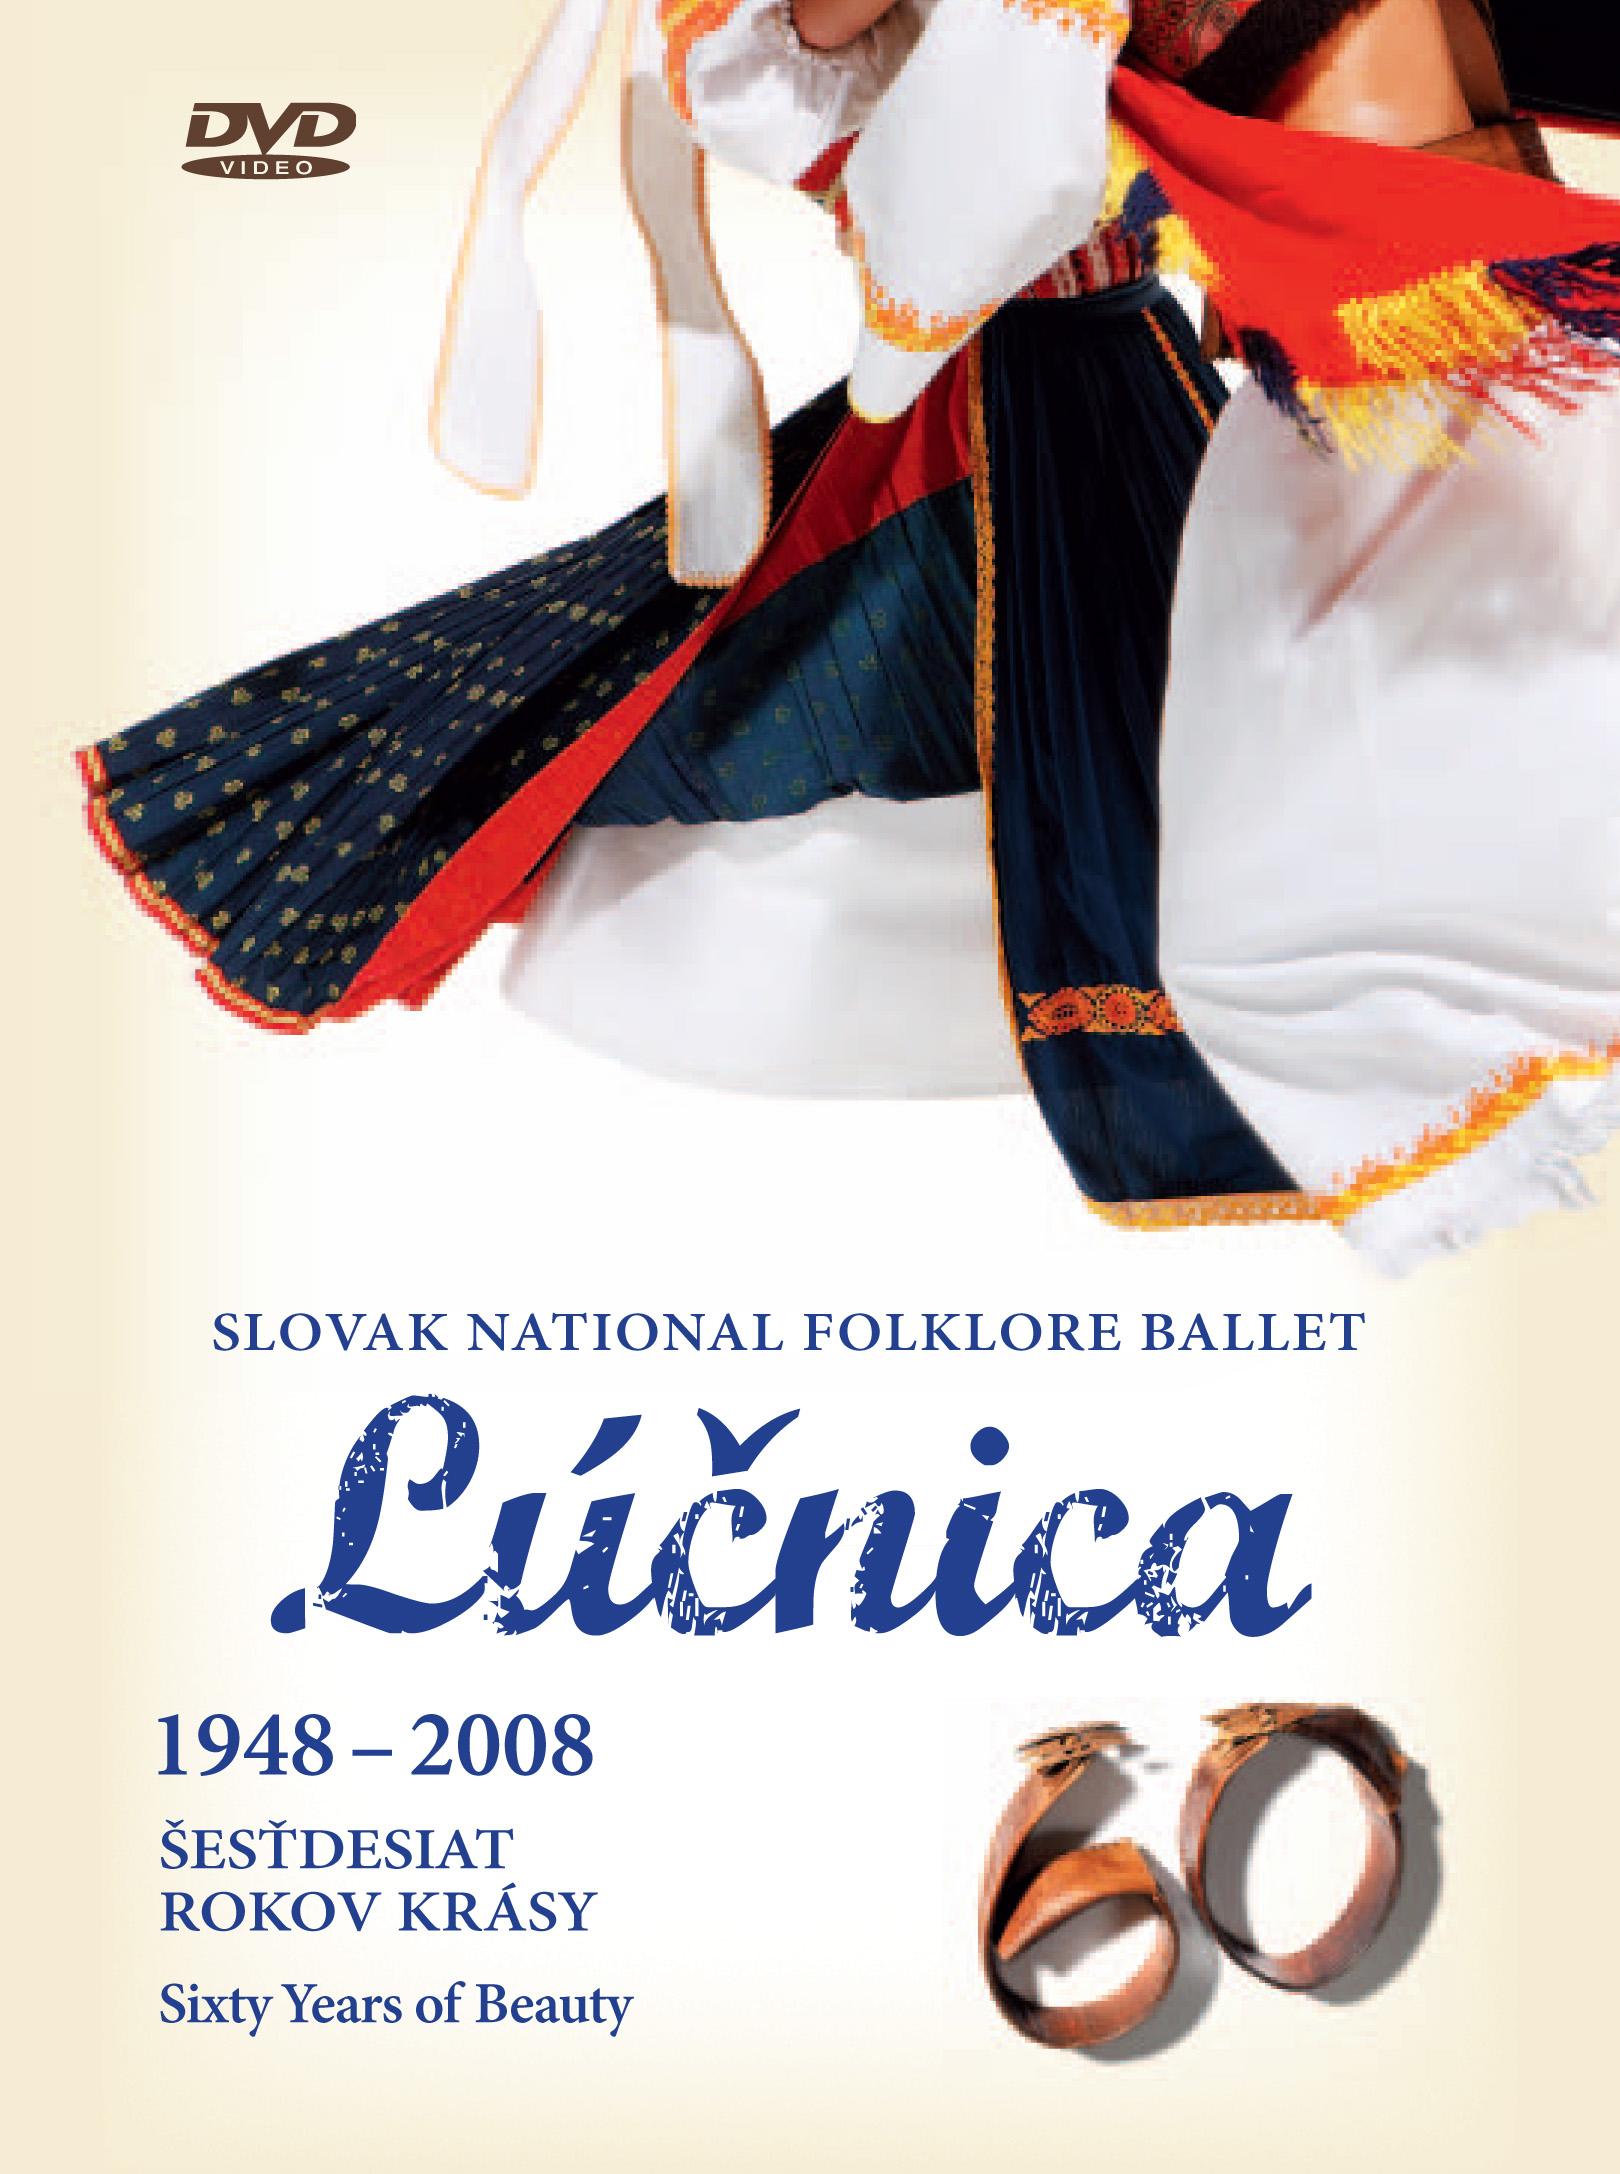 1948-2008 SESTDESIAT ROKOV KRASY - supermusic.sk